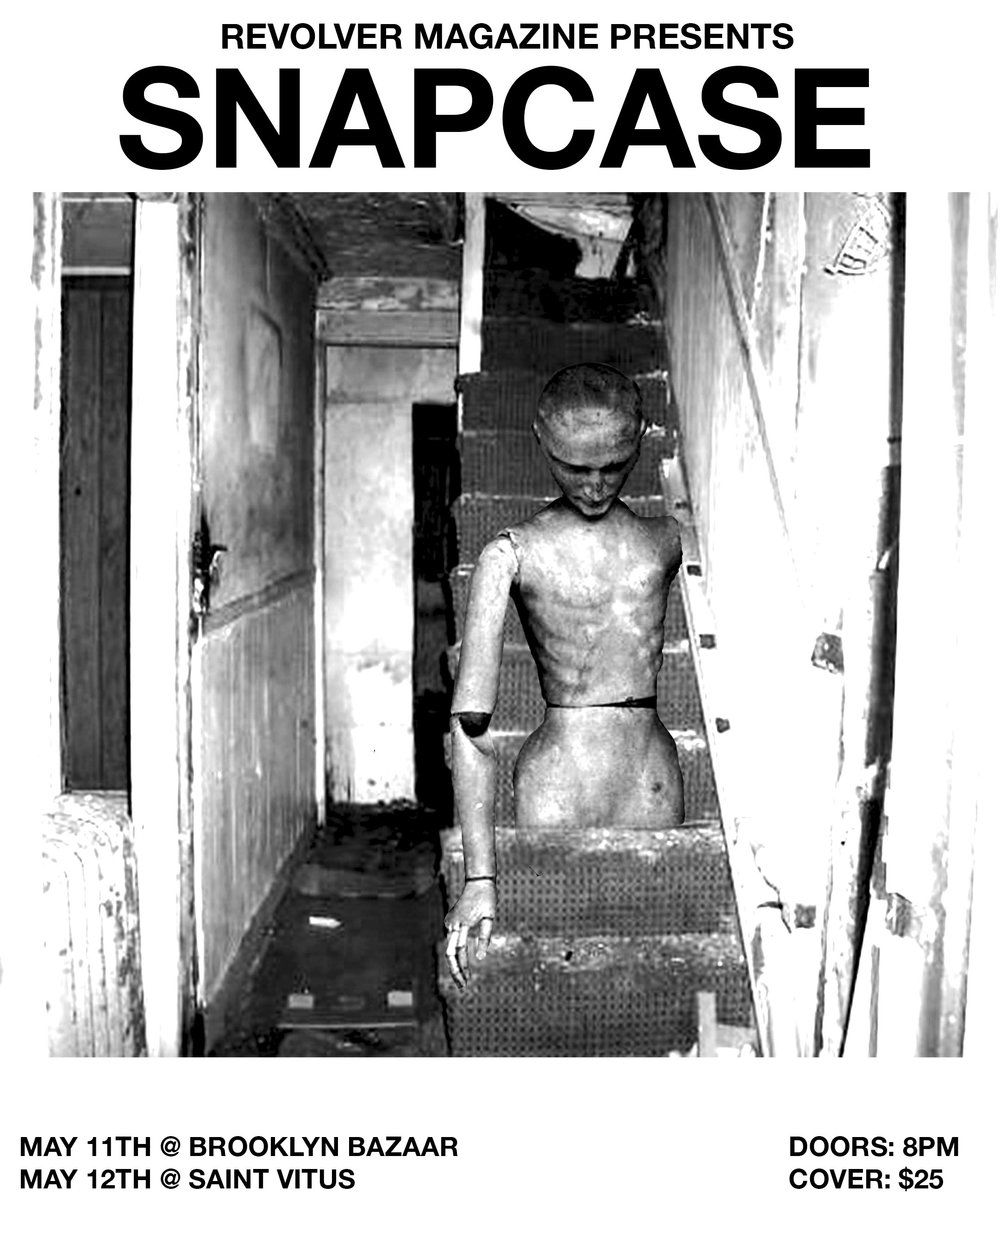 Snapcaseflierone.jpg